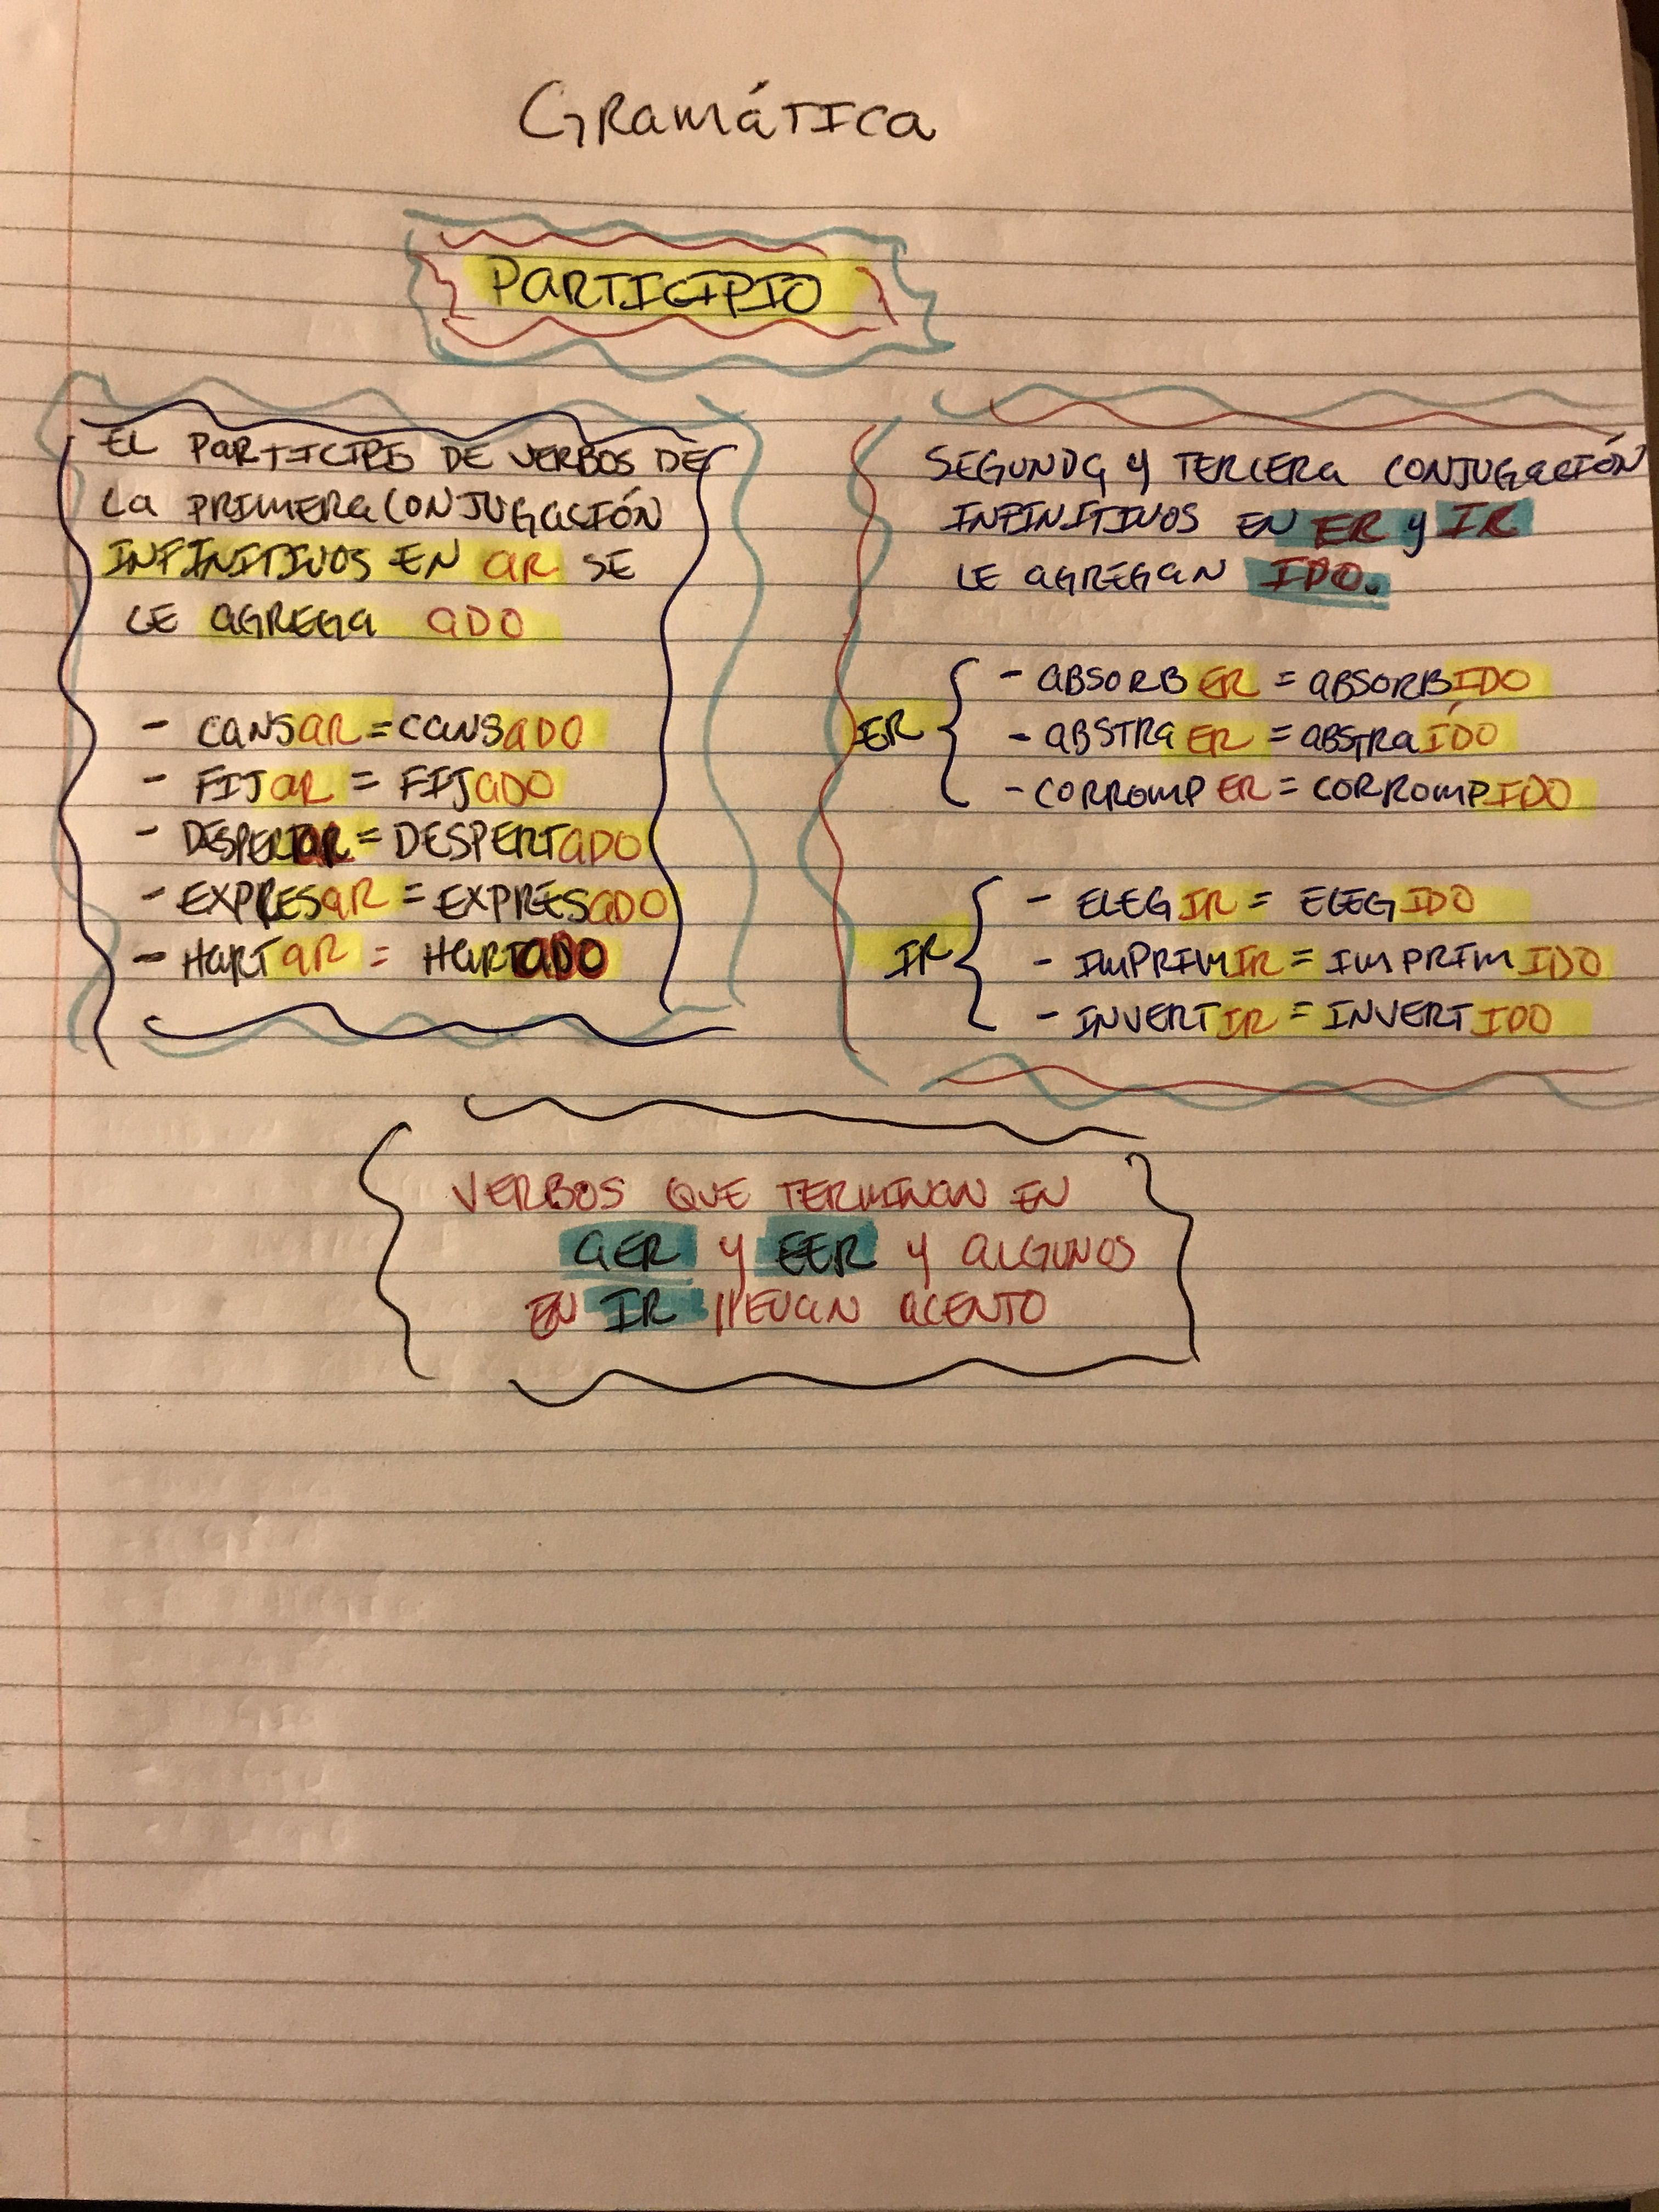 Las reglas para poder usar el participio. | Bullet journal. Sheet music. Journal